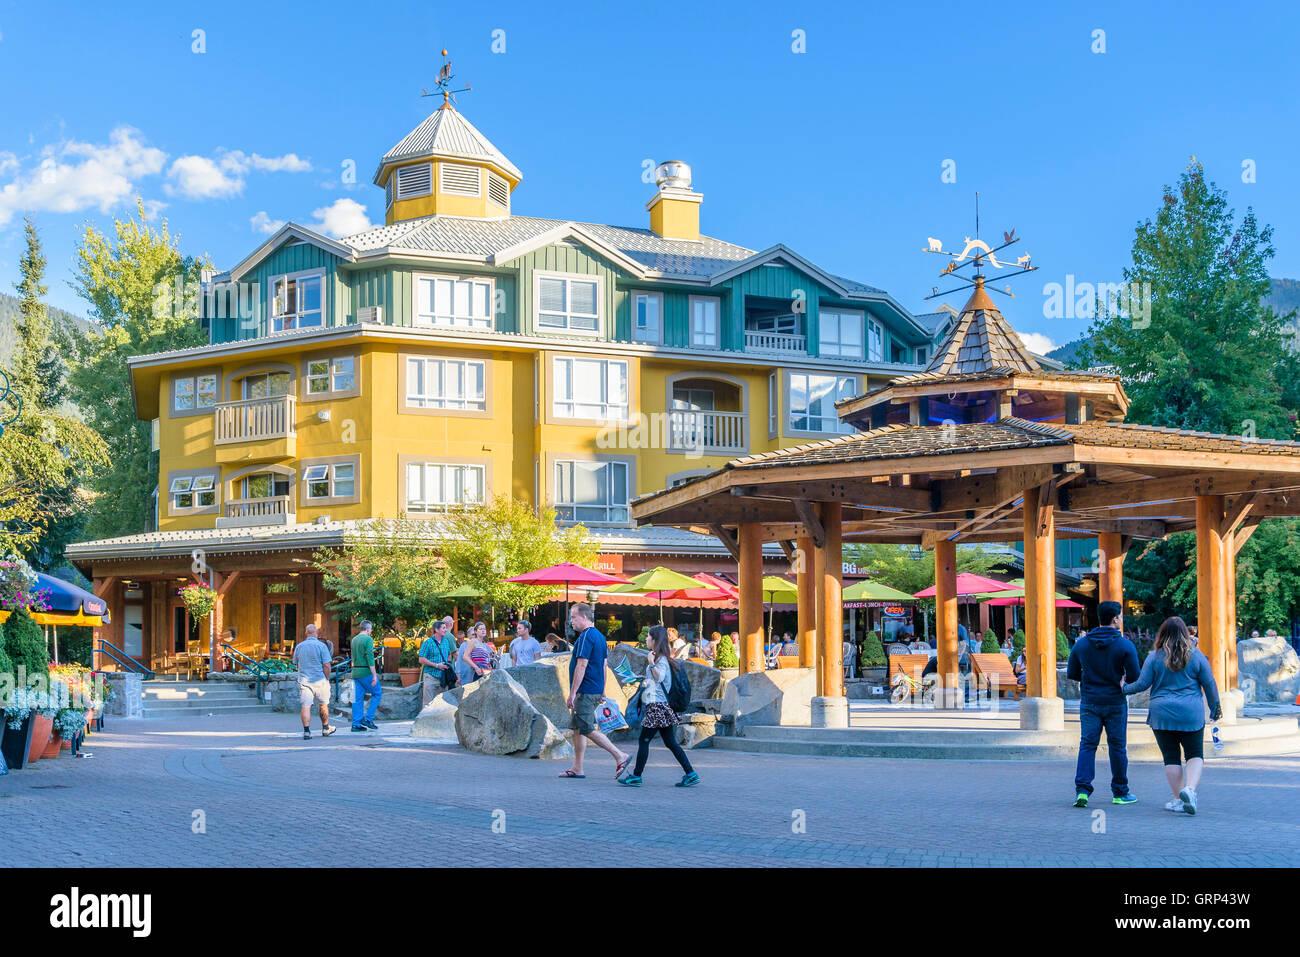 Town Plaza, Whistler Village, Whistler, British Columbia, Canada. - Stock Image